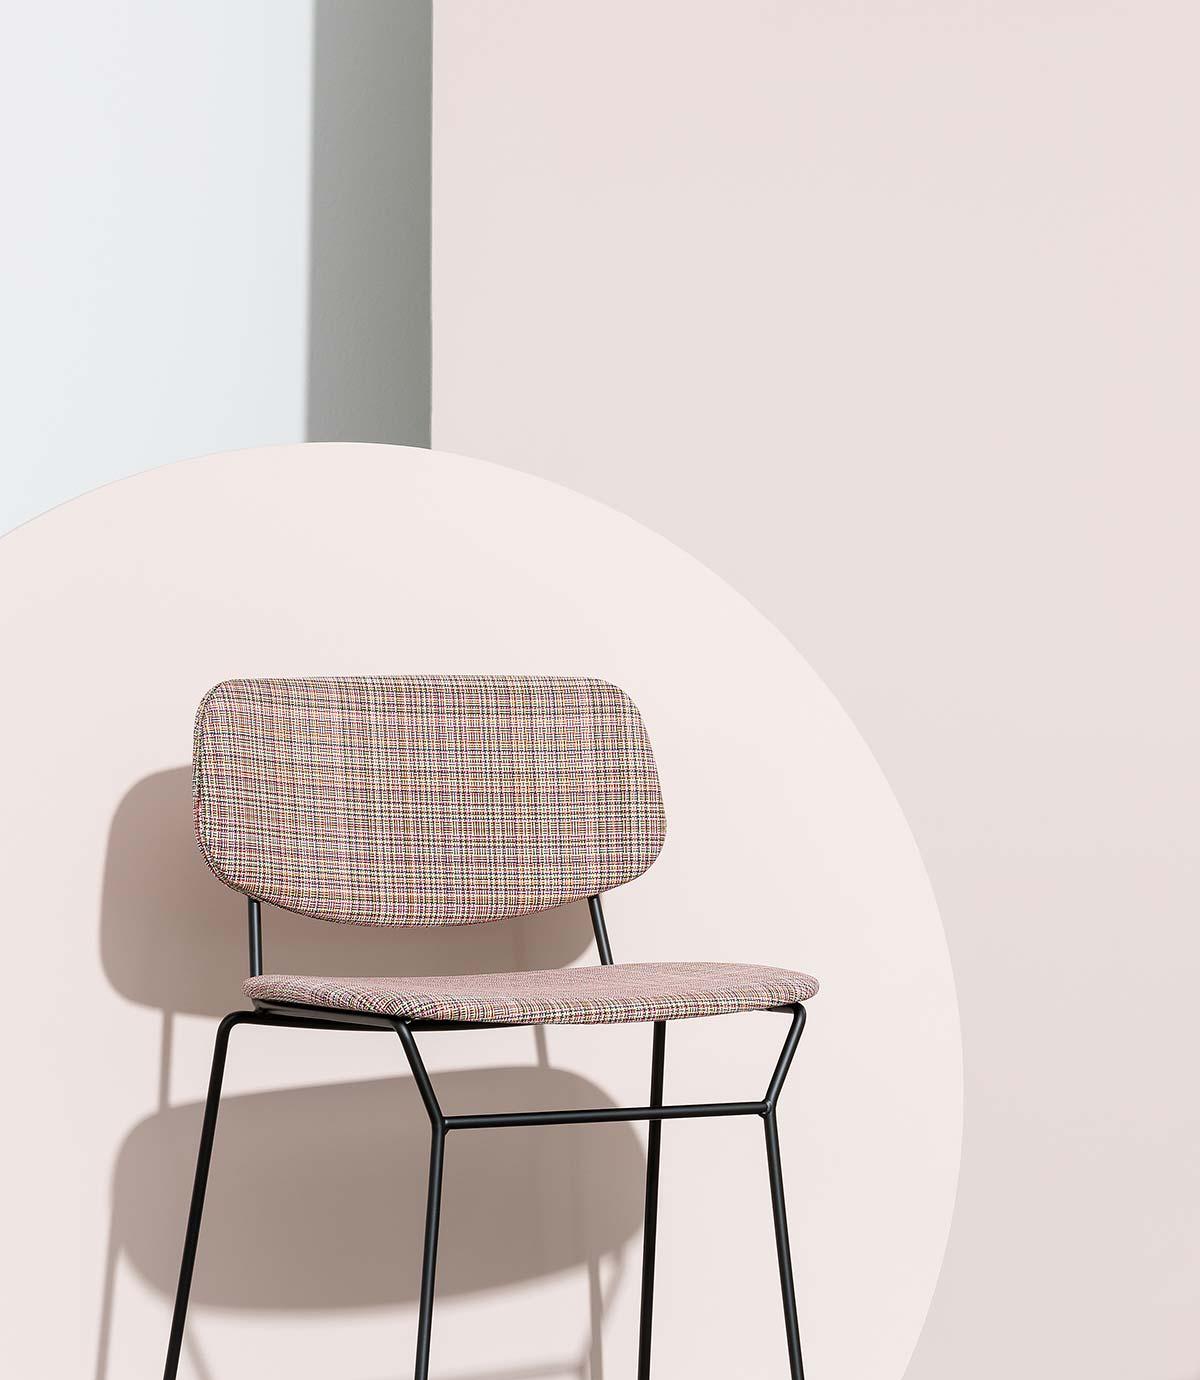 Sedute Doll by Emilio Nanni